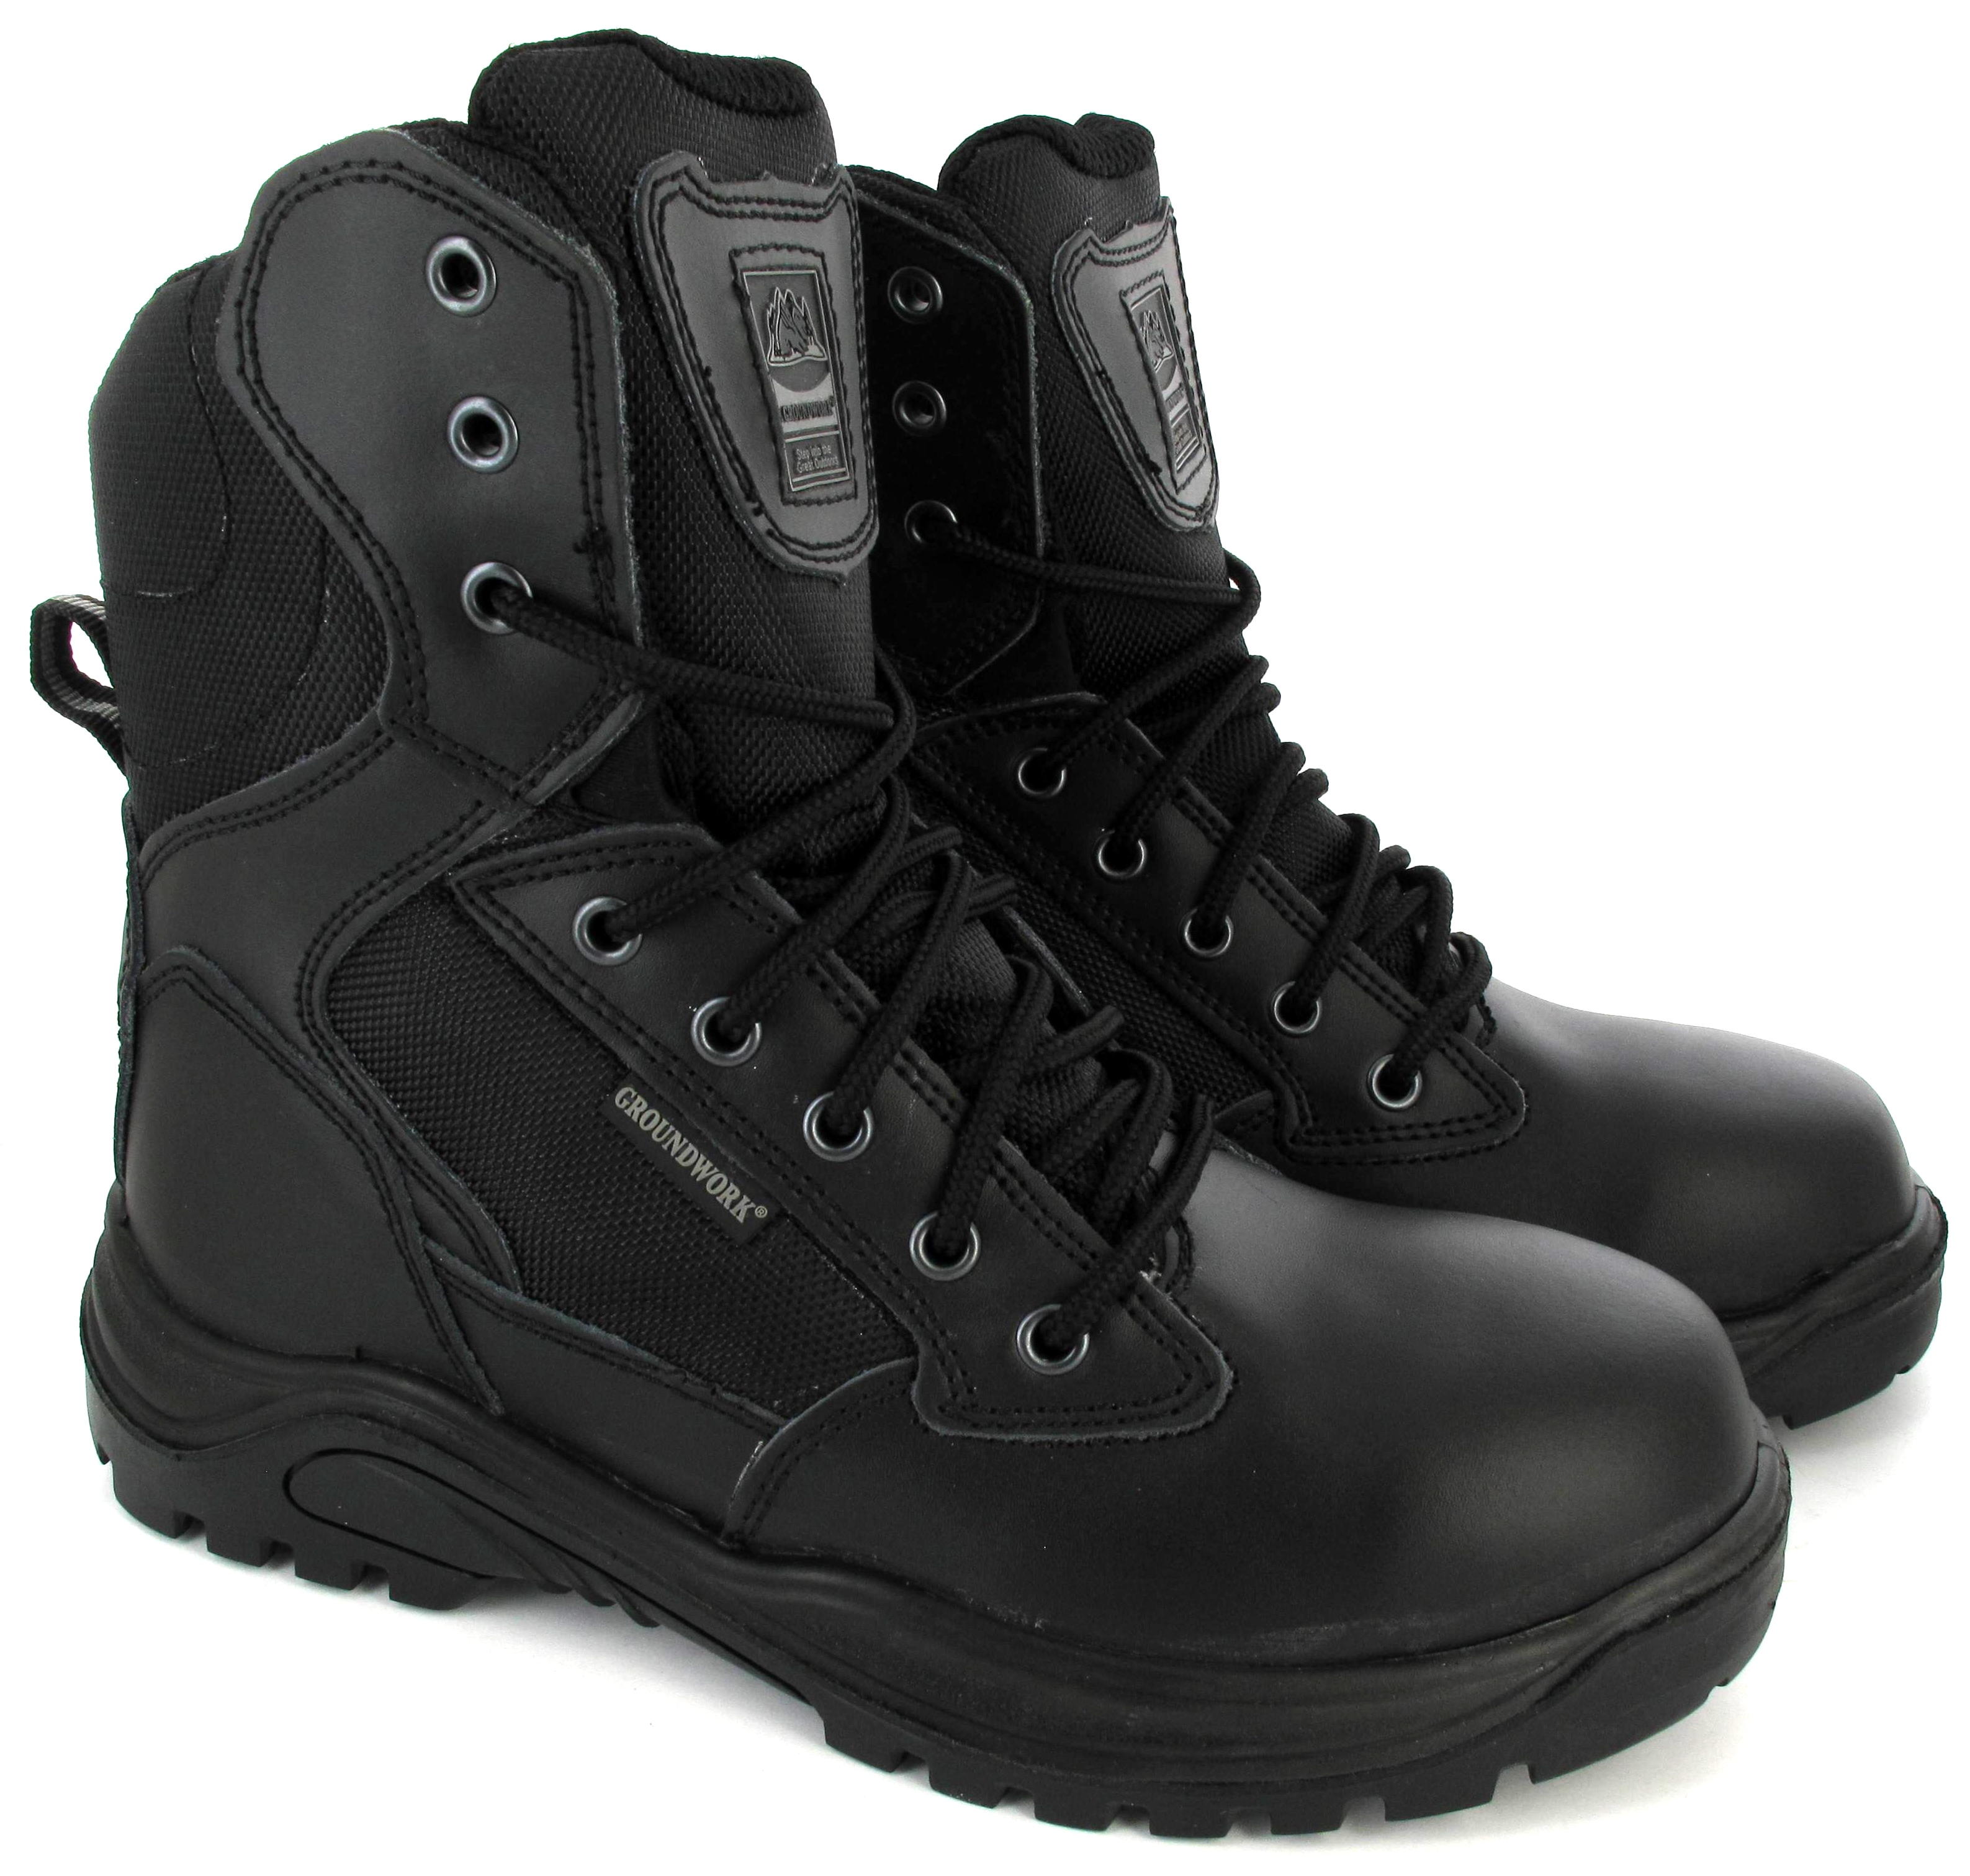 Swat Shoes Uk